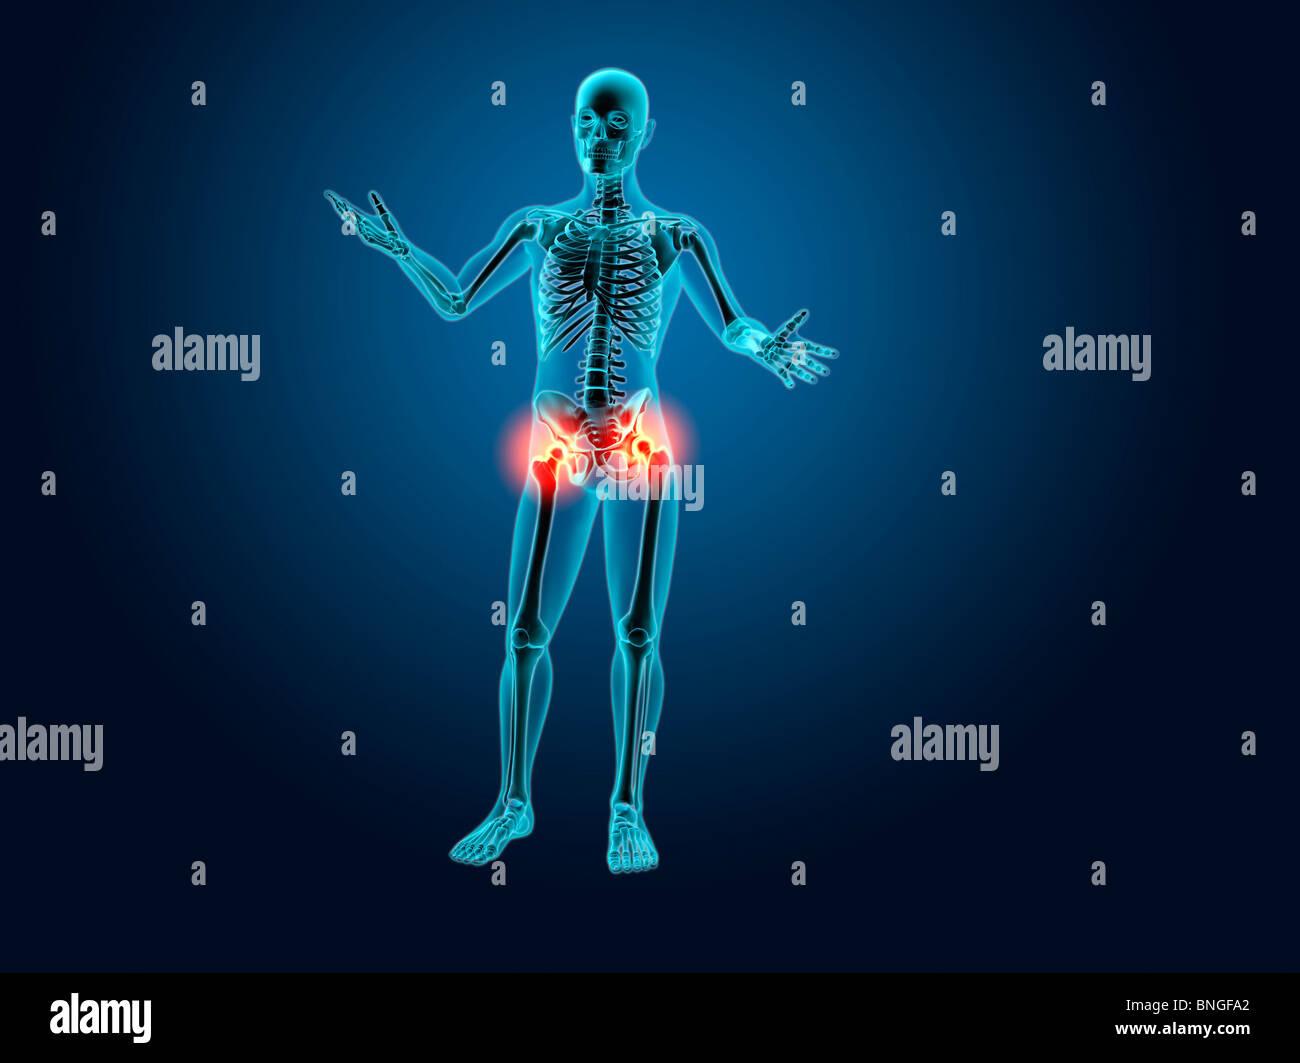 Joint Inflammation Imágenes De Stock & Joint Inflammation Fotos De ...